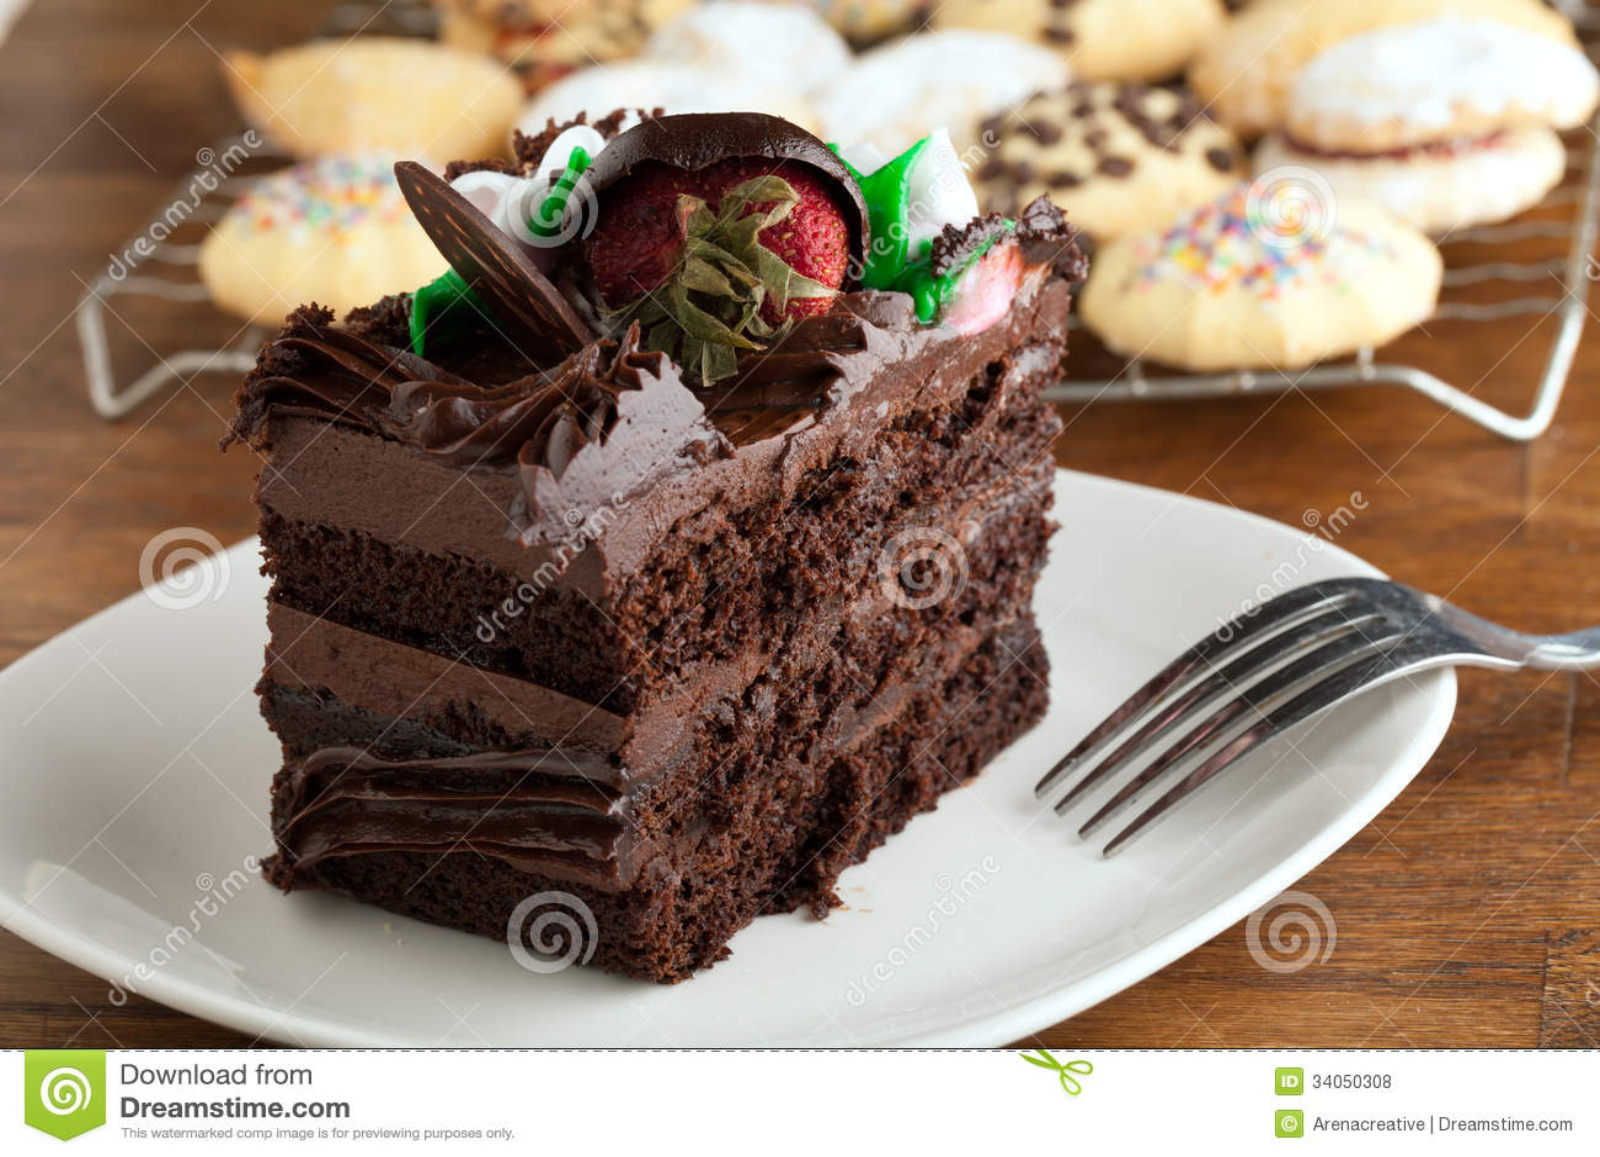 Sugar Free Chocolate Peanut Butter Cake